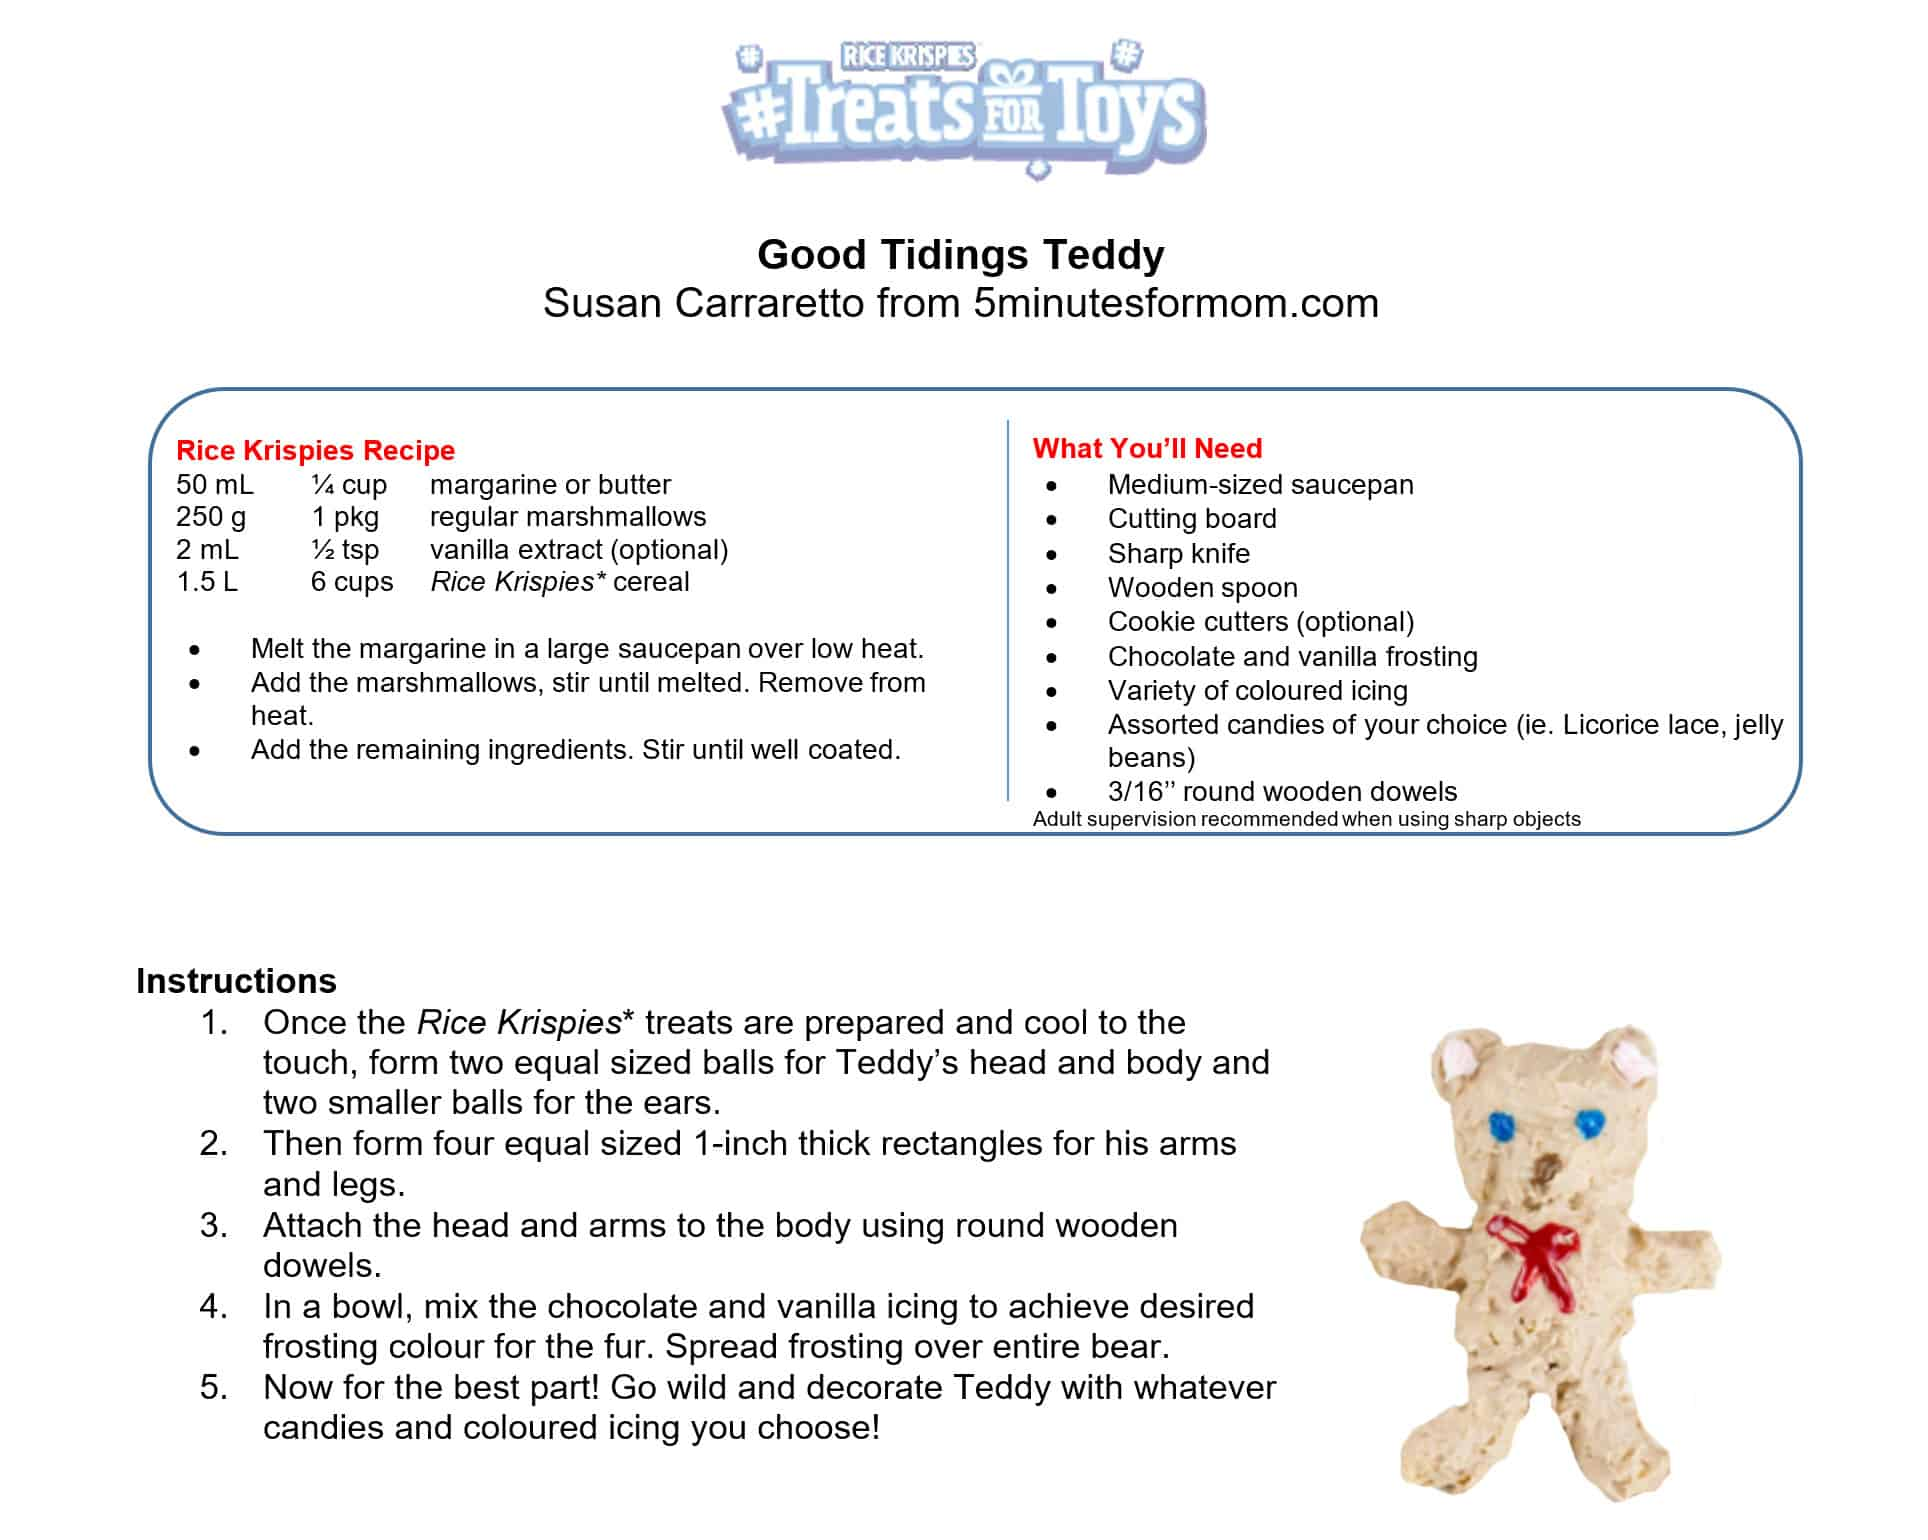 good-tidings-teddy-rice-krispies-treats-recipe-5m4m